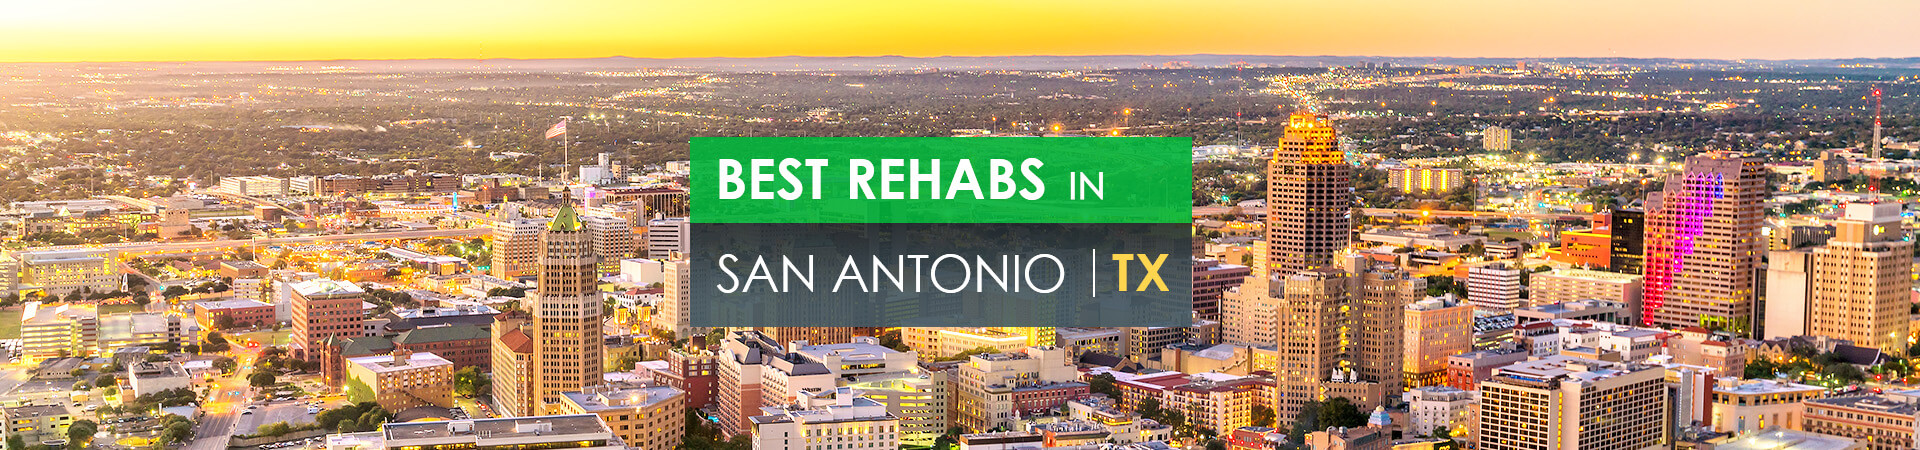 Best rehabs in San Antonio, TX